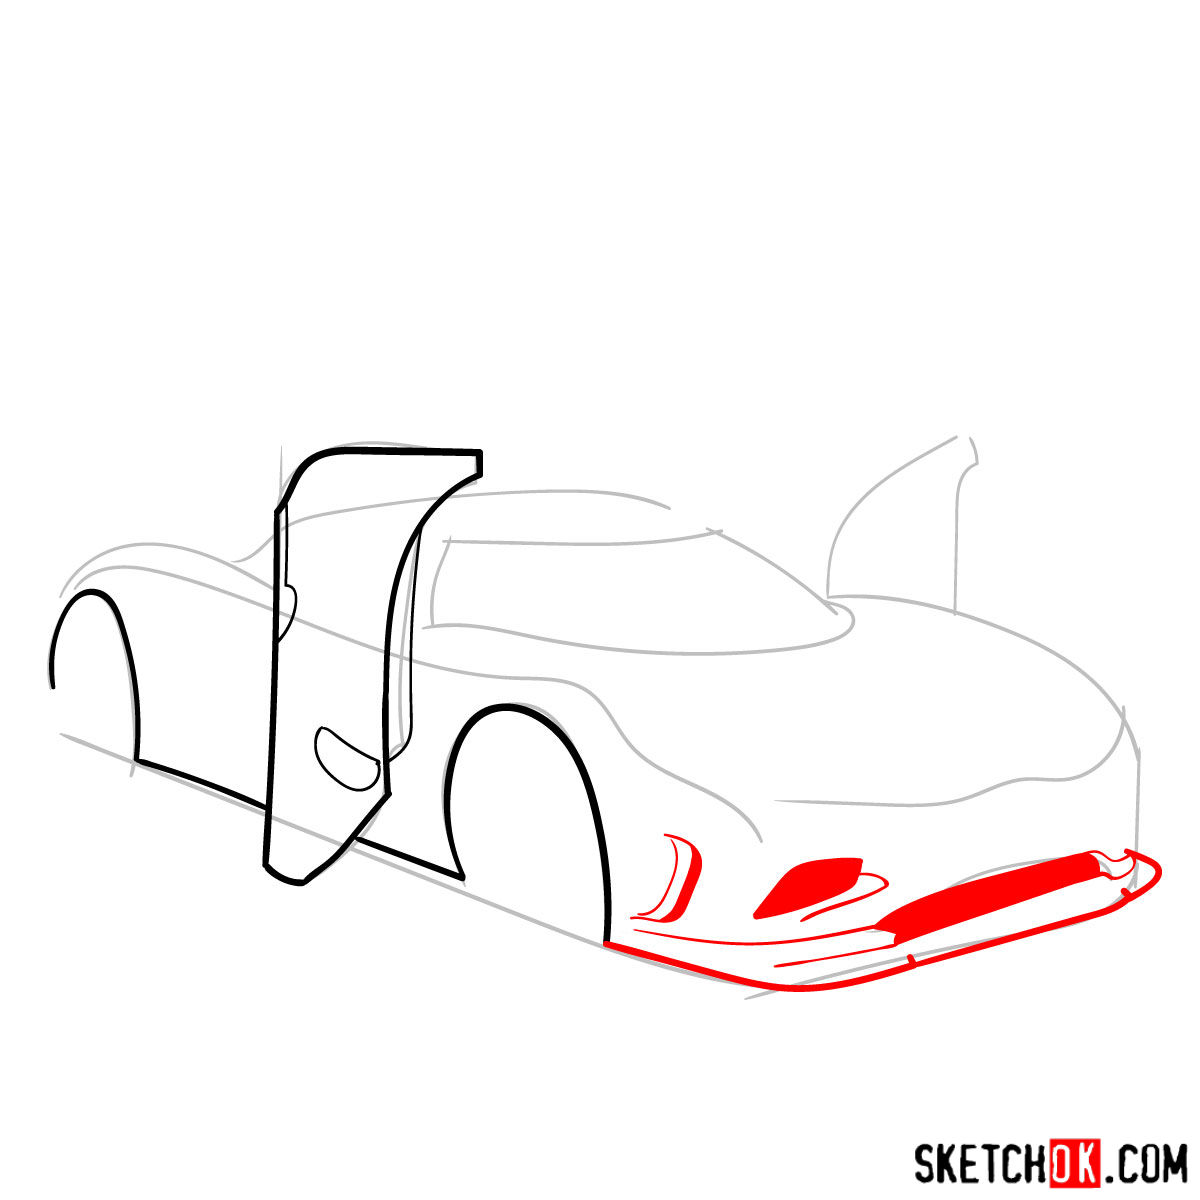 How to draw Koenigsegg Agera R Oman - step 04